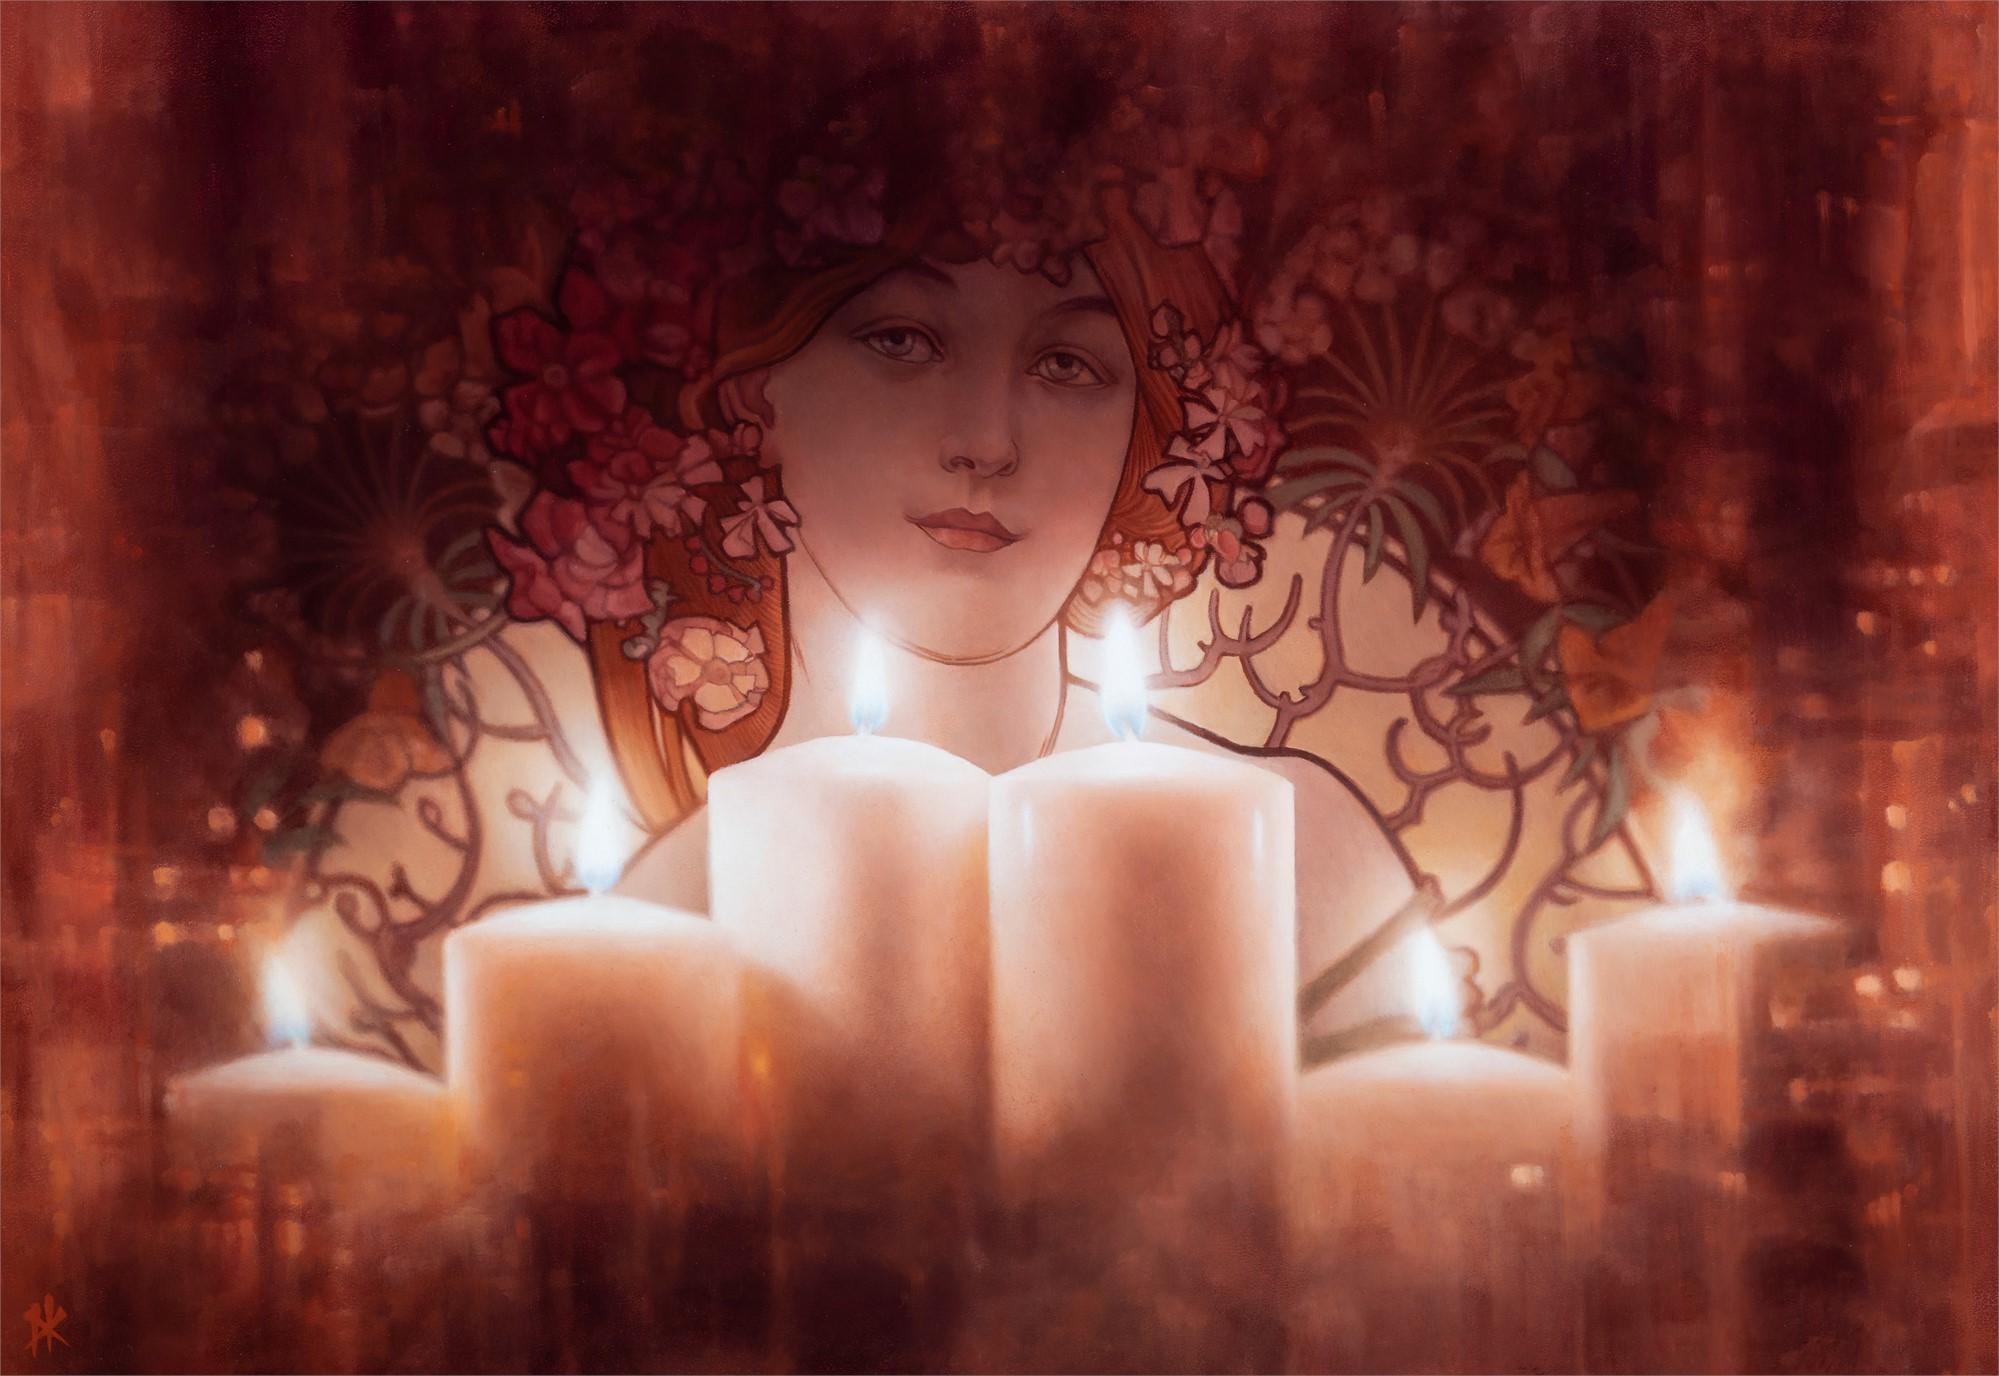 Bohemian Reverie by Patrick Kramer